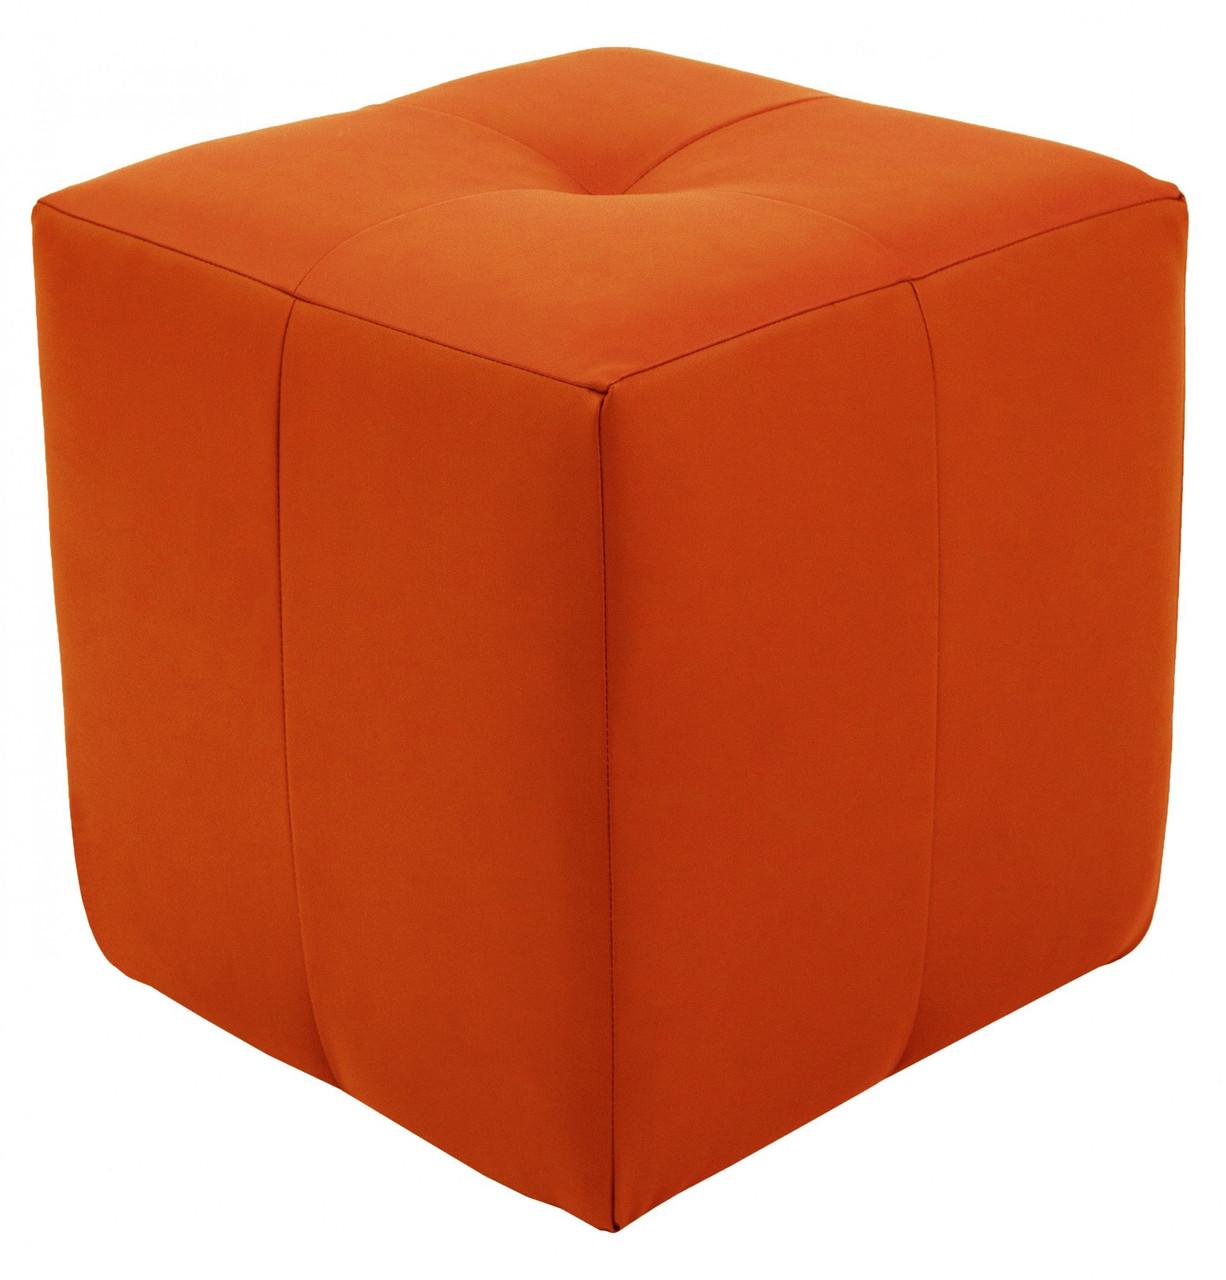 Пуфик Кристи Richman 40 x 40 x 45Н Fly 2218 Оранжевый